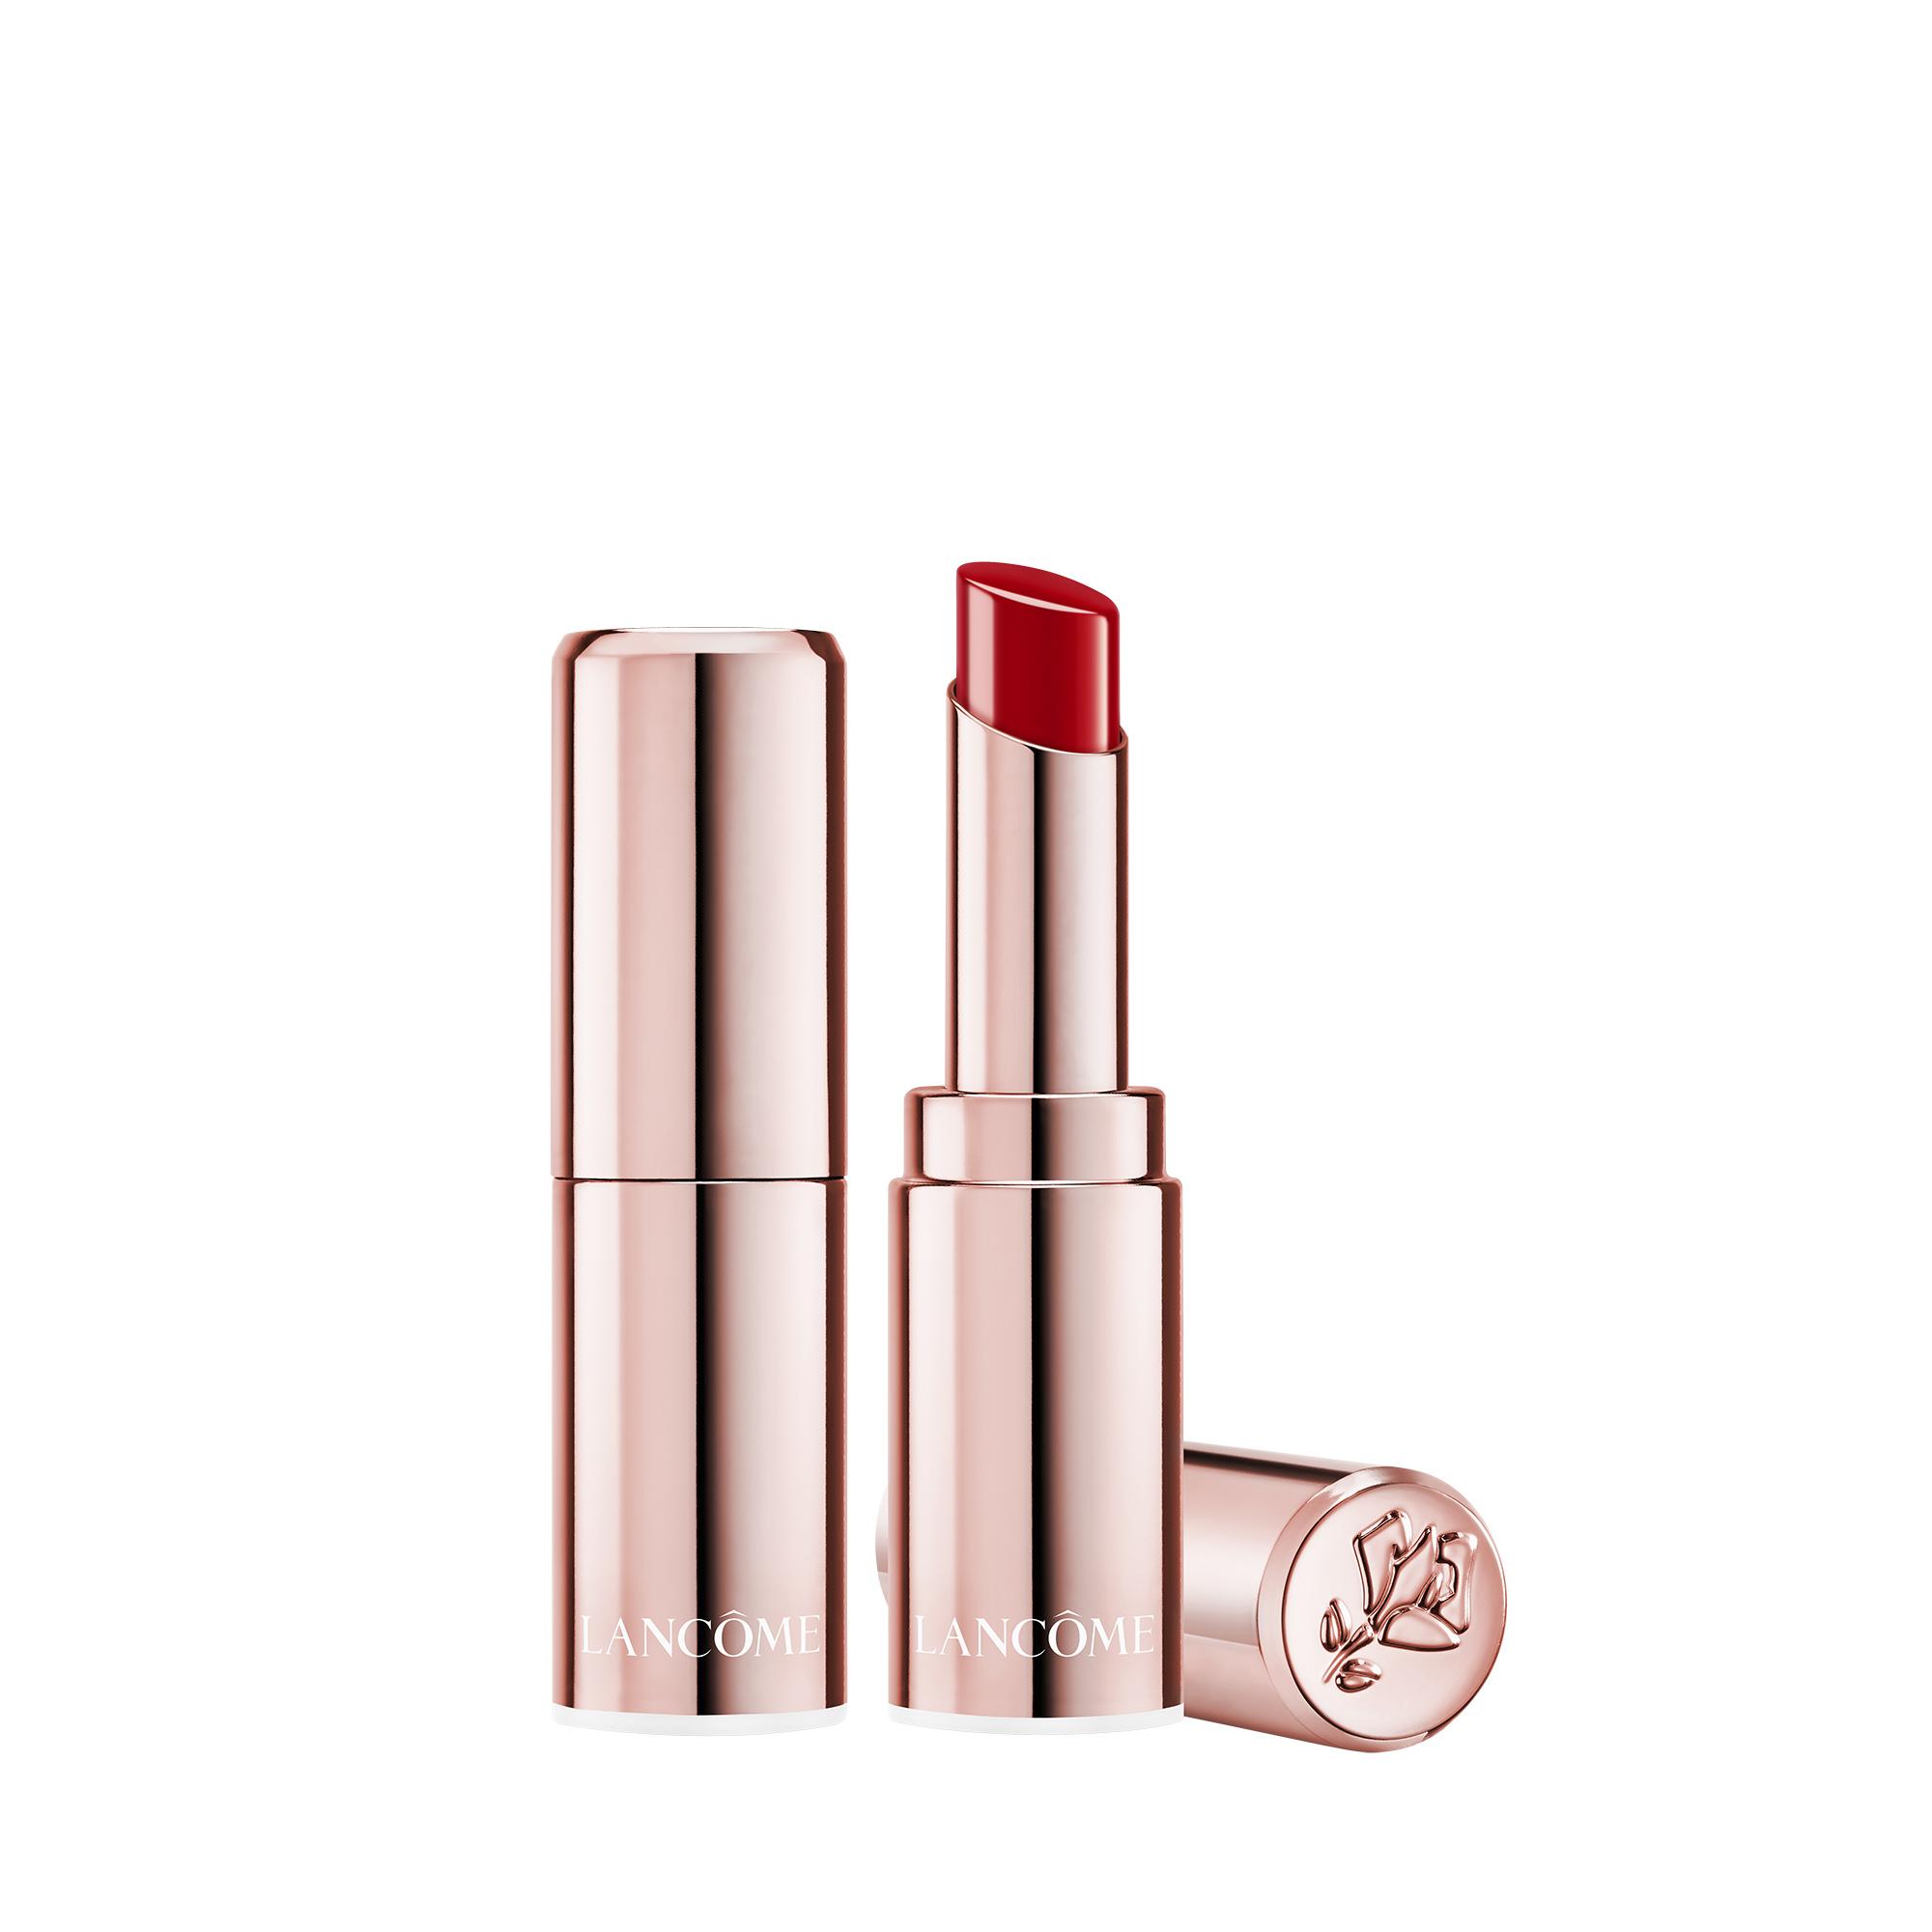 Lancôme Mademoiselle Shine Lipstick, 132 caprice